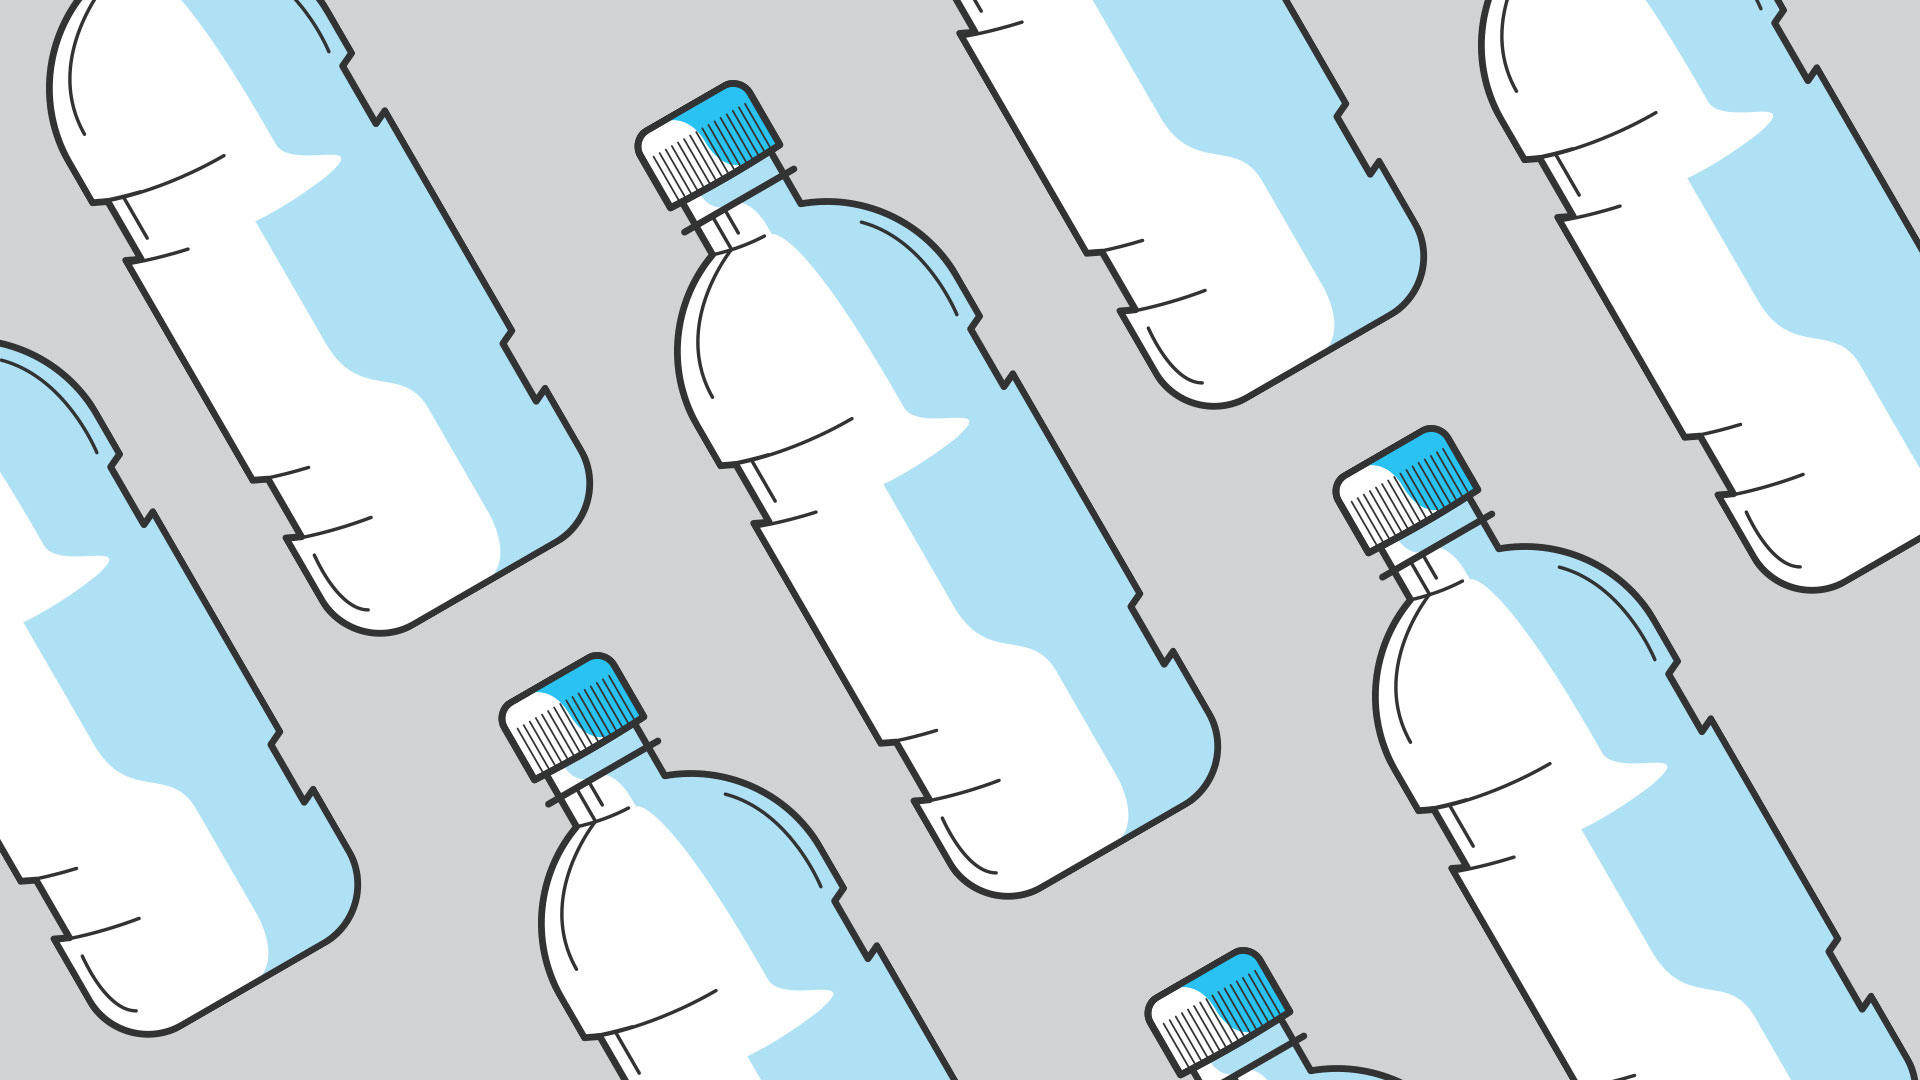 Material illustration: Plastic